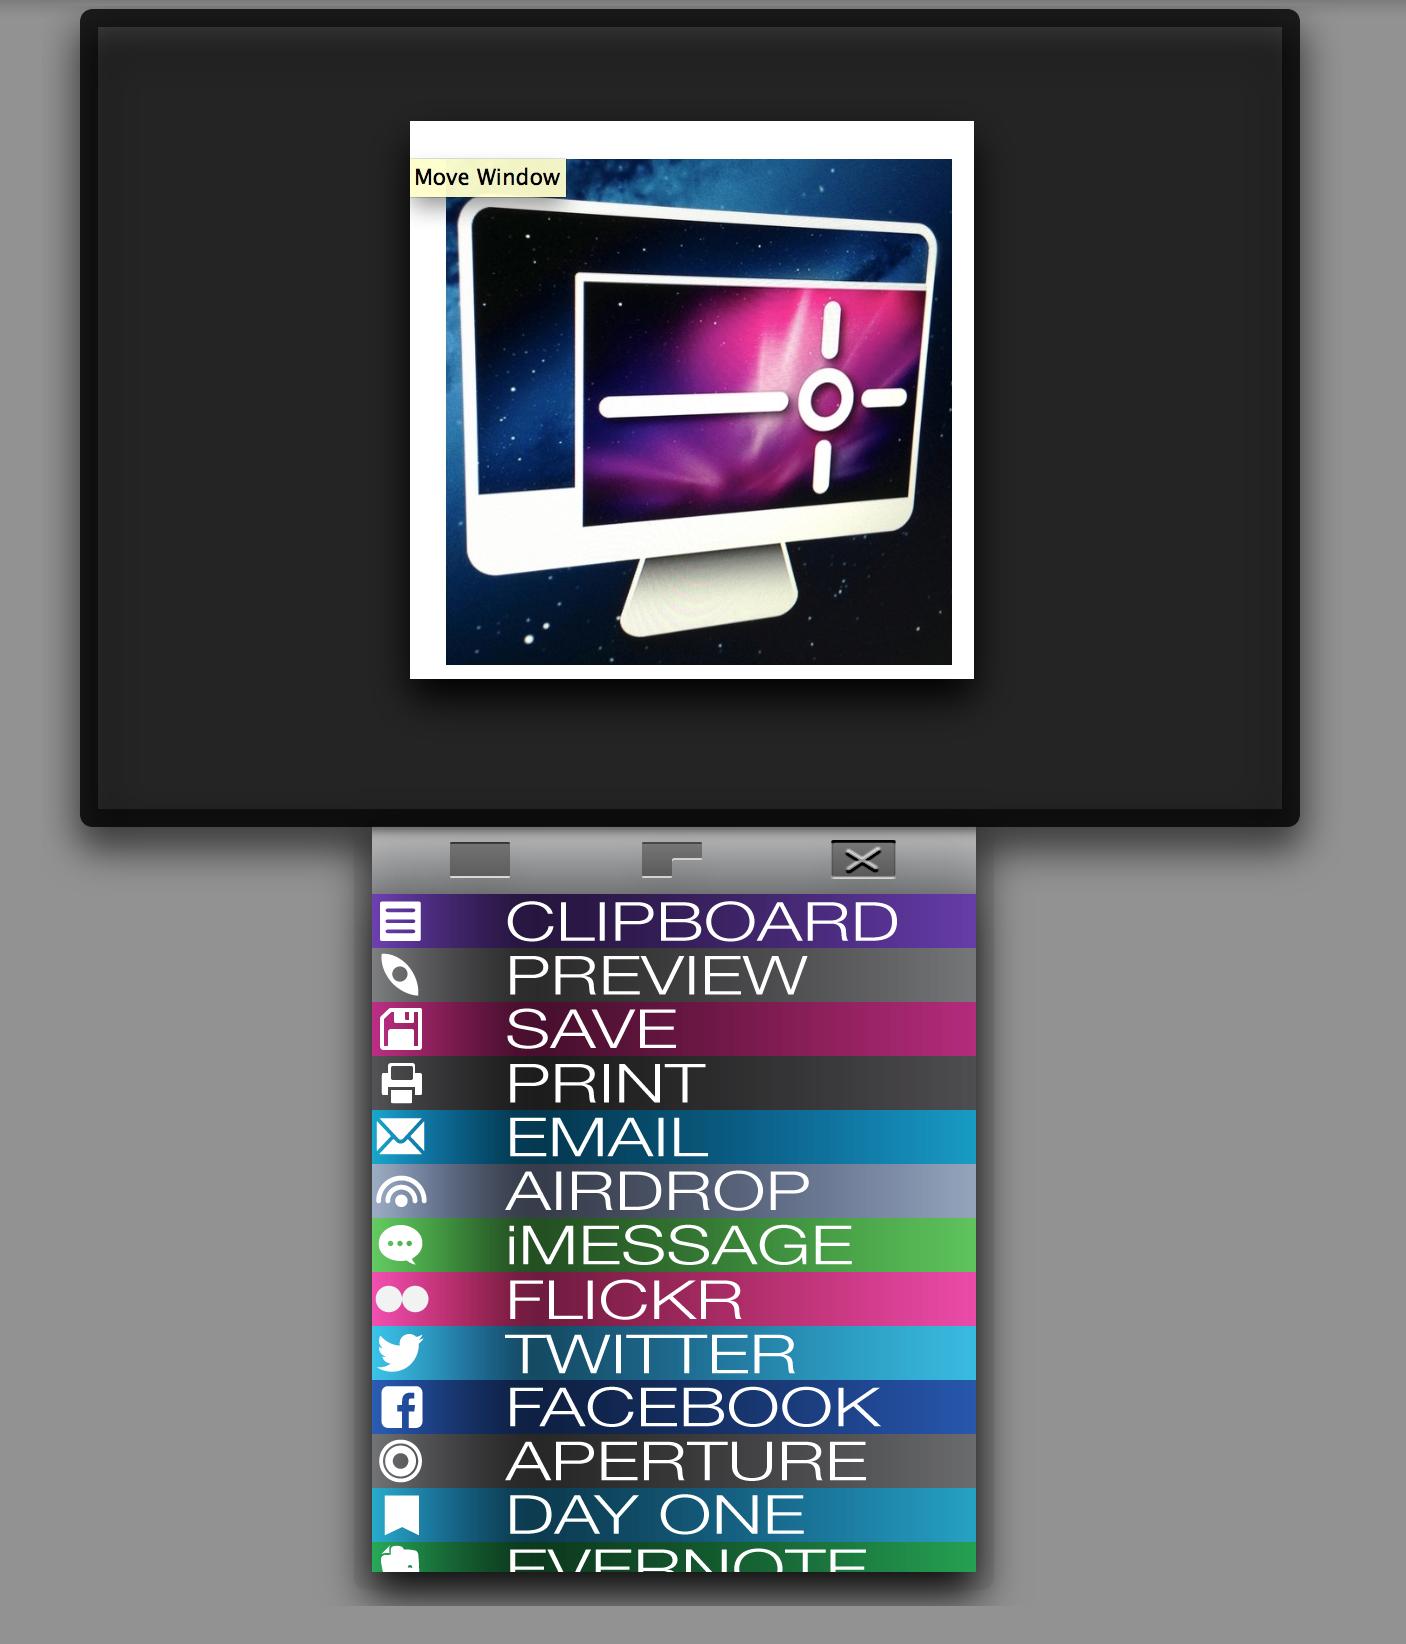 Screenshot 2013-11-17 21.20.59.png